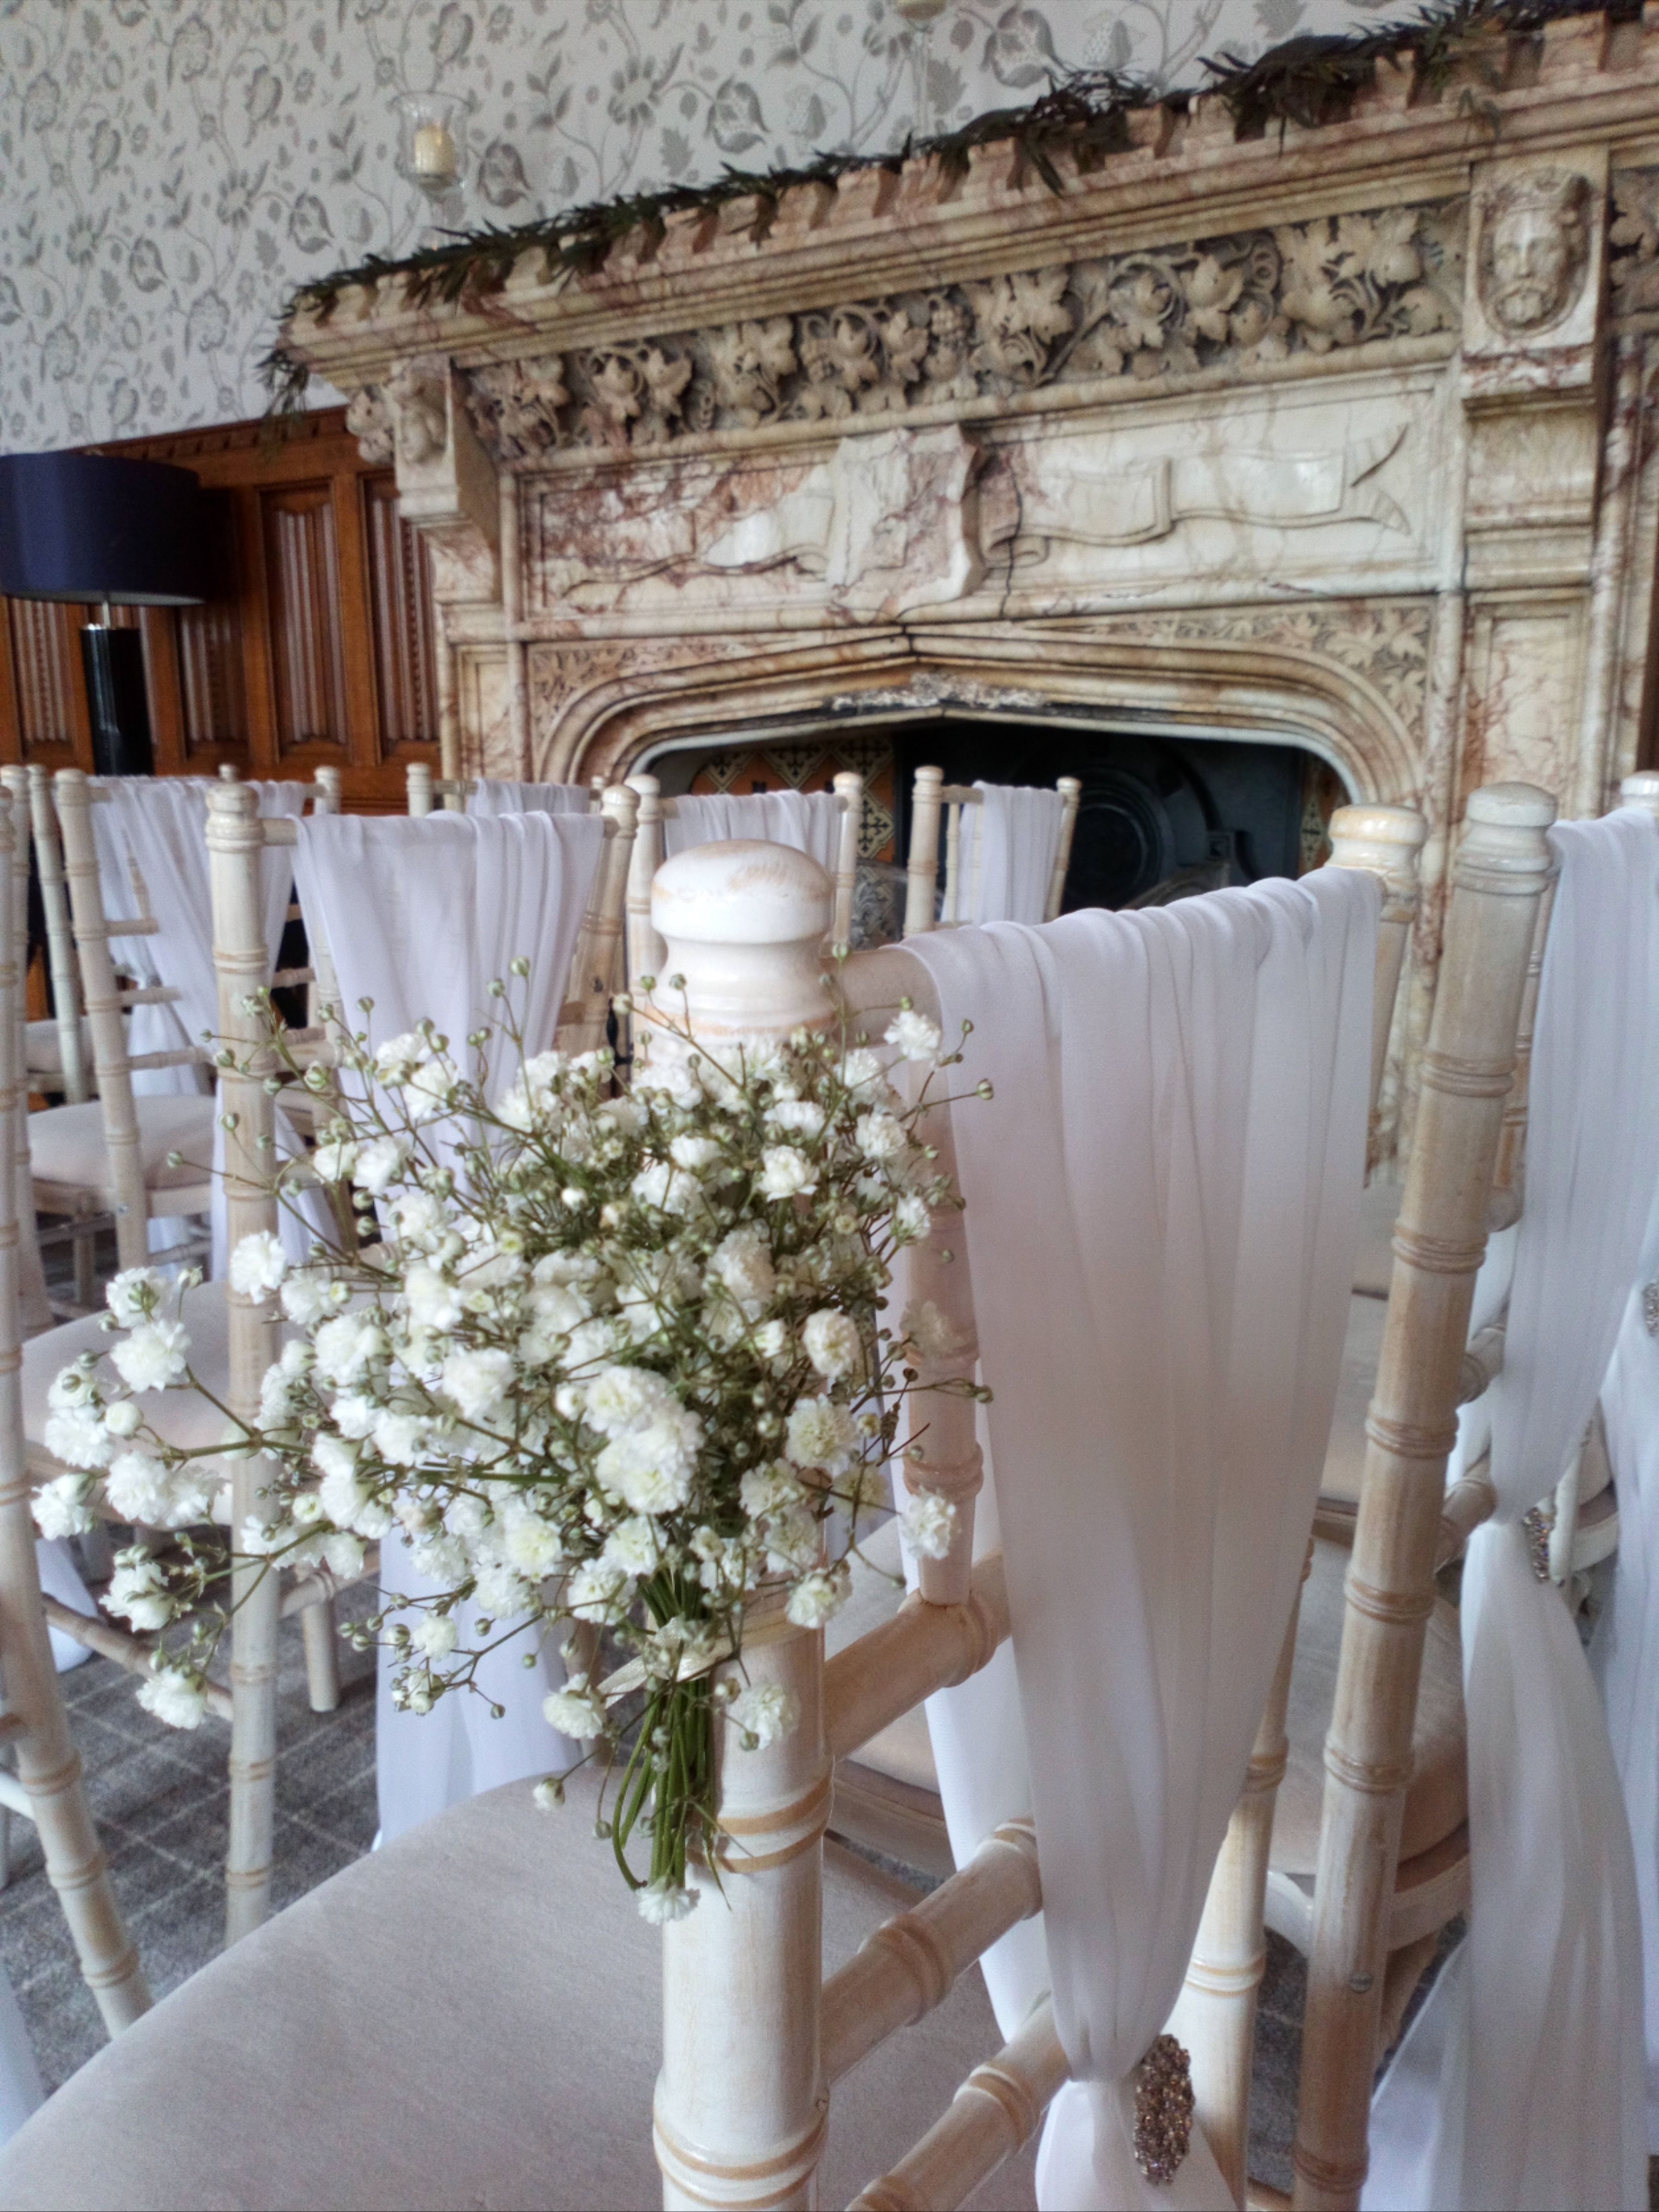 Pretty Wedding At Hensol Castle In 2020 Chiavari Chairs Chiavari Table Decorations